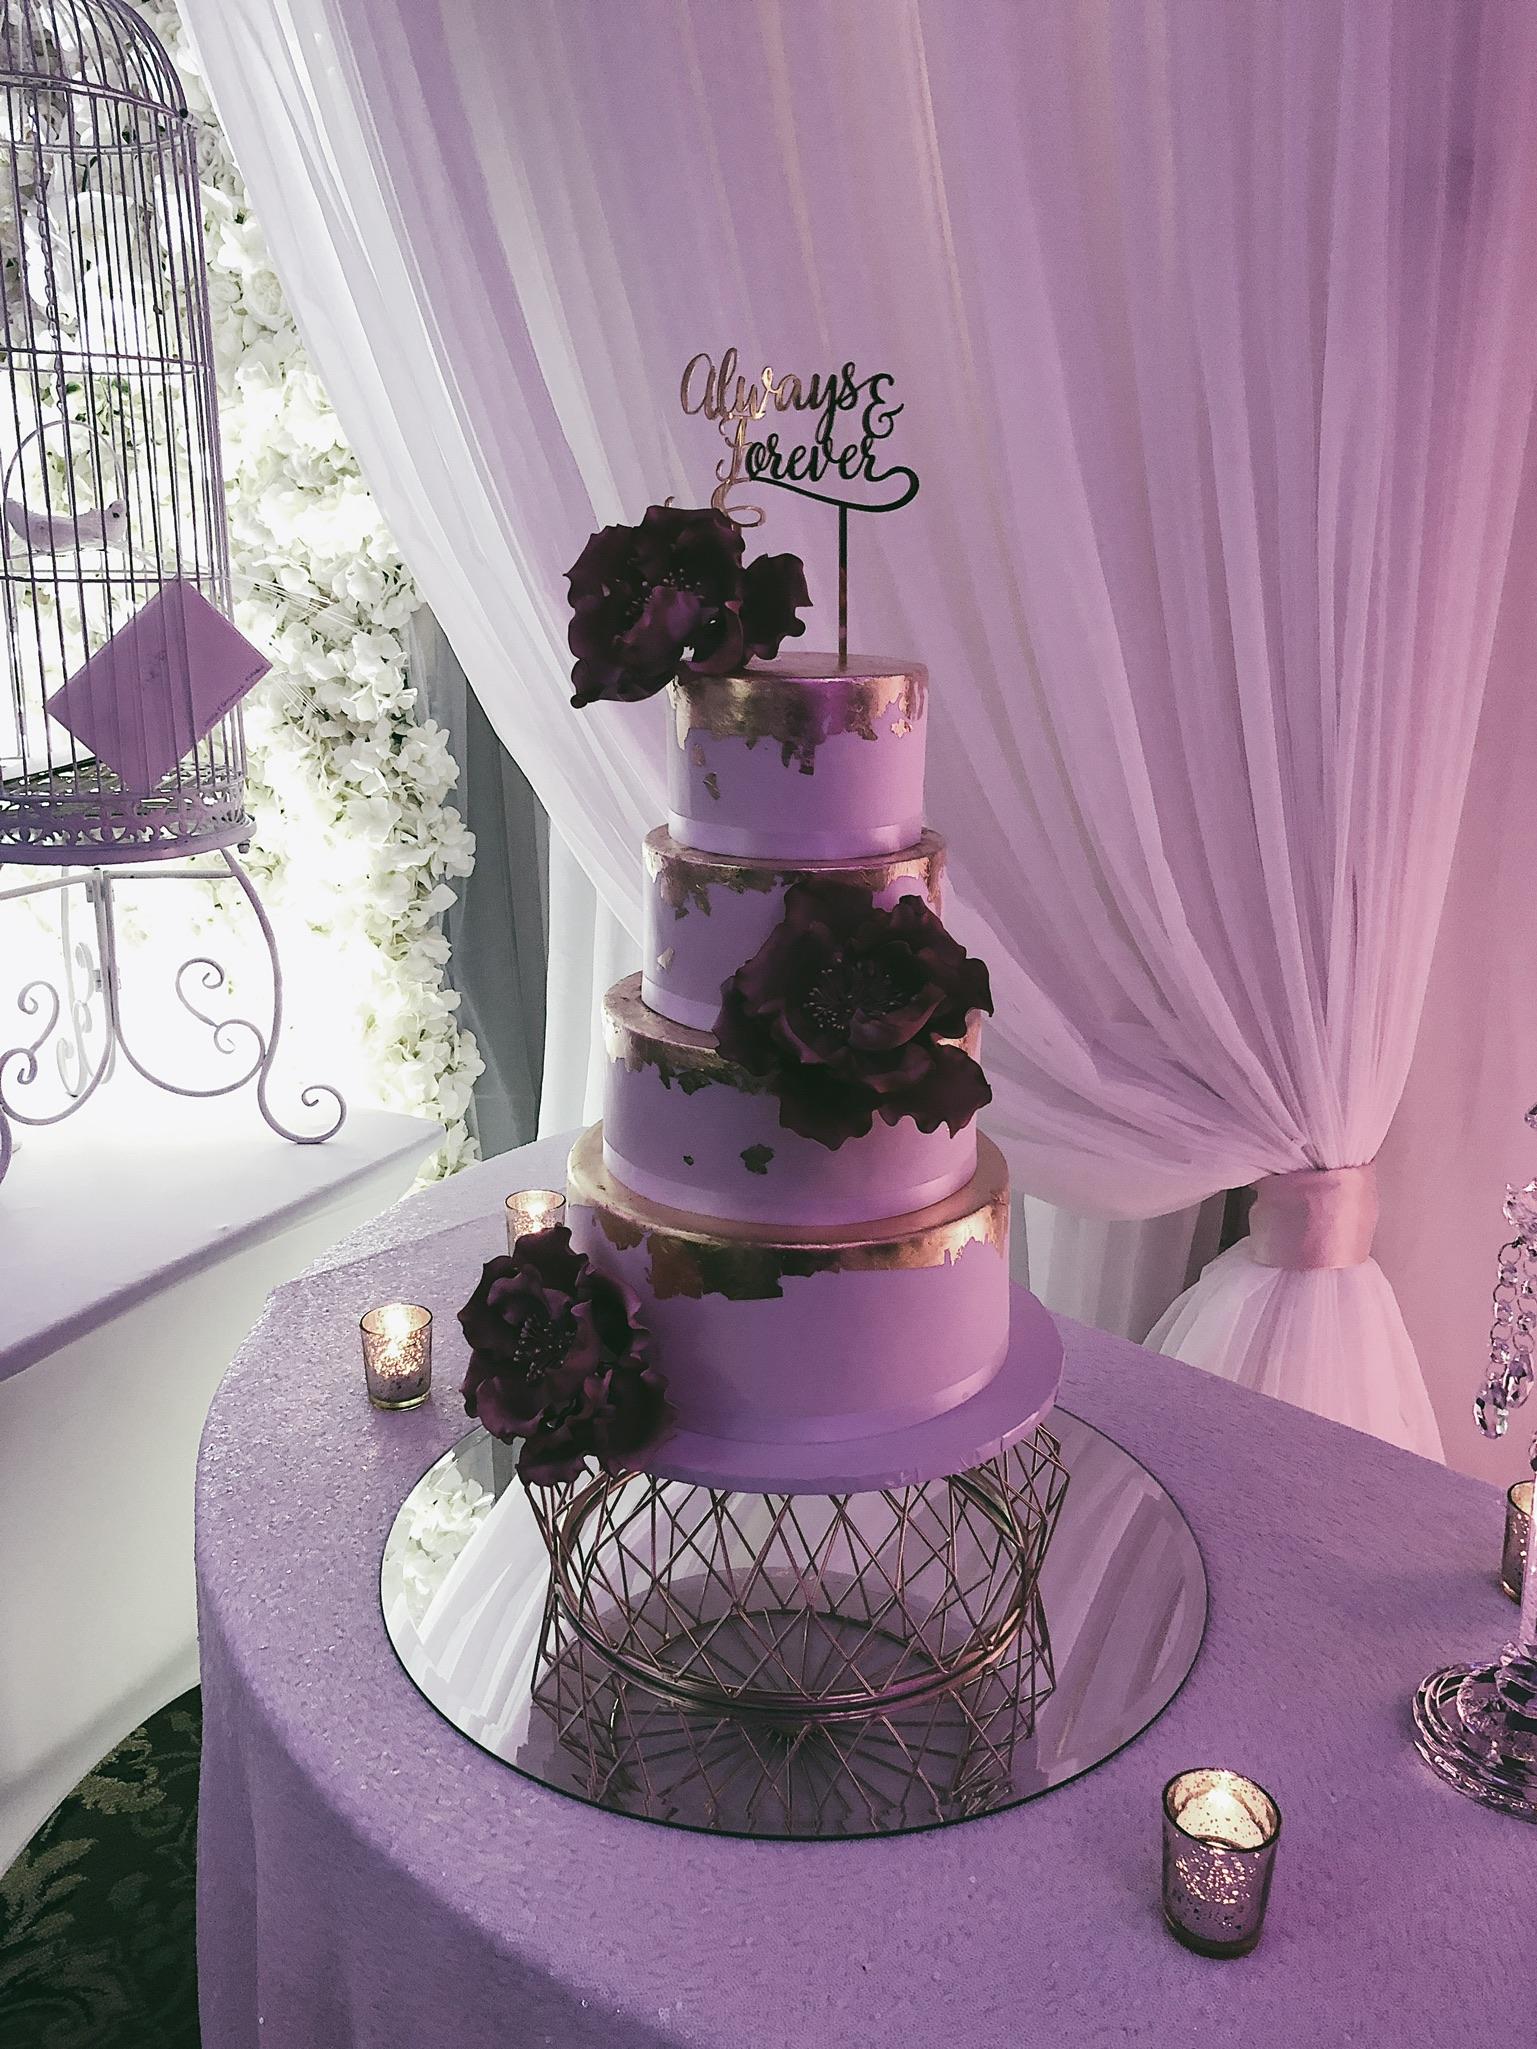 Lebanese wedding, cake, purple lights